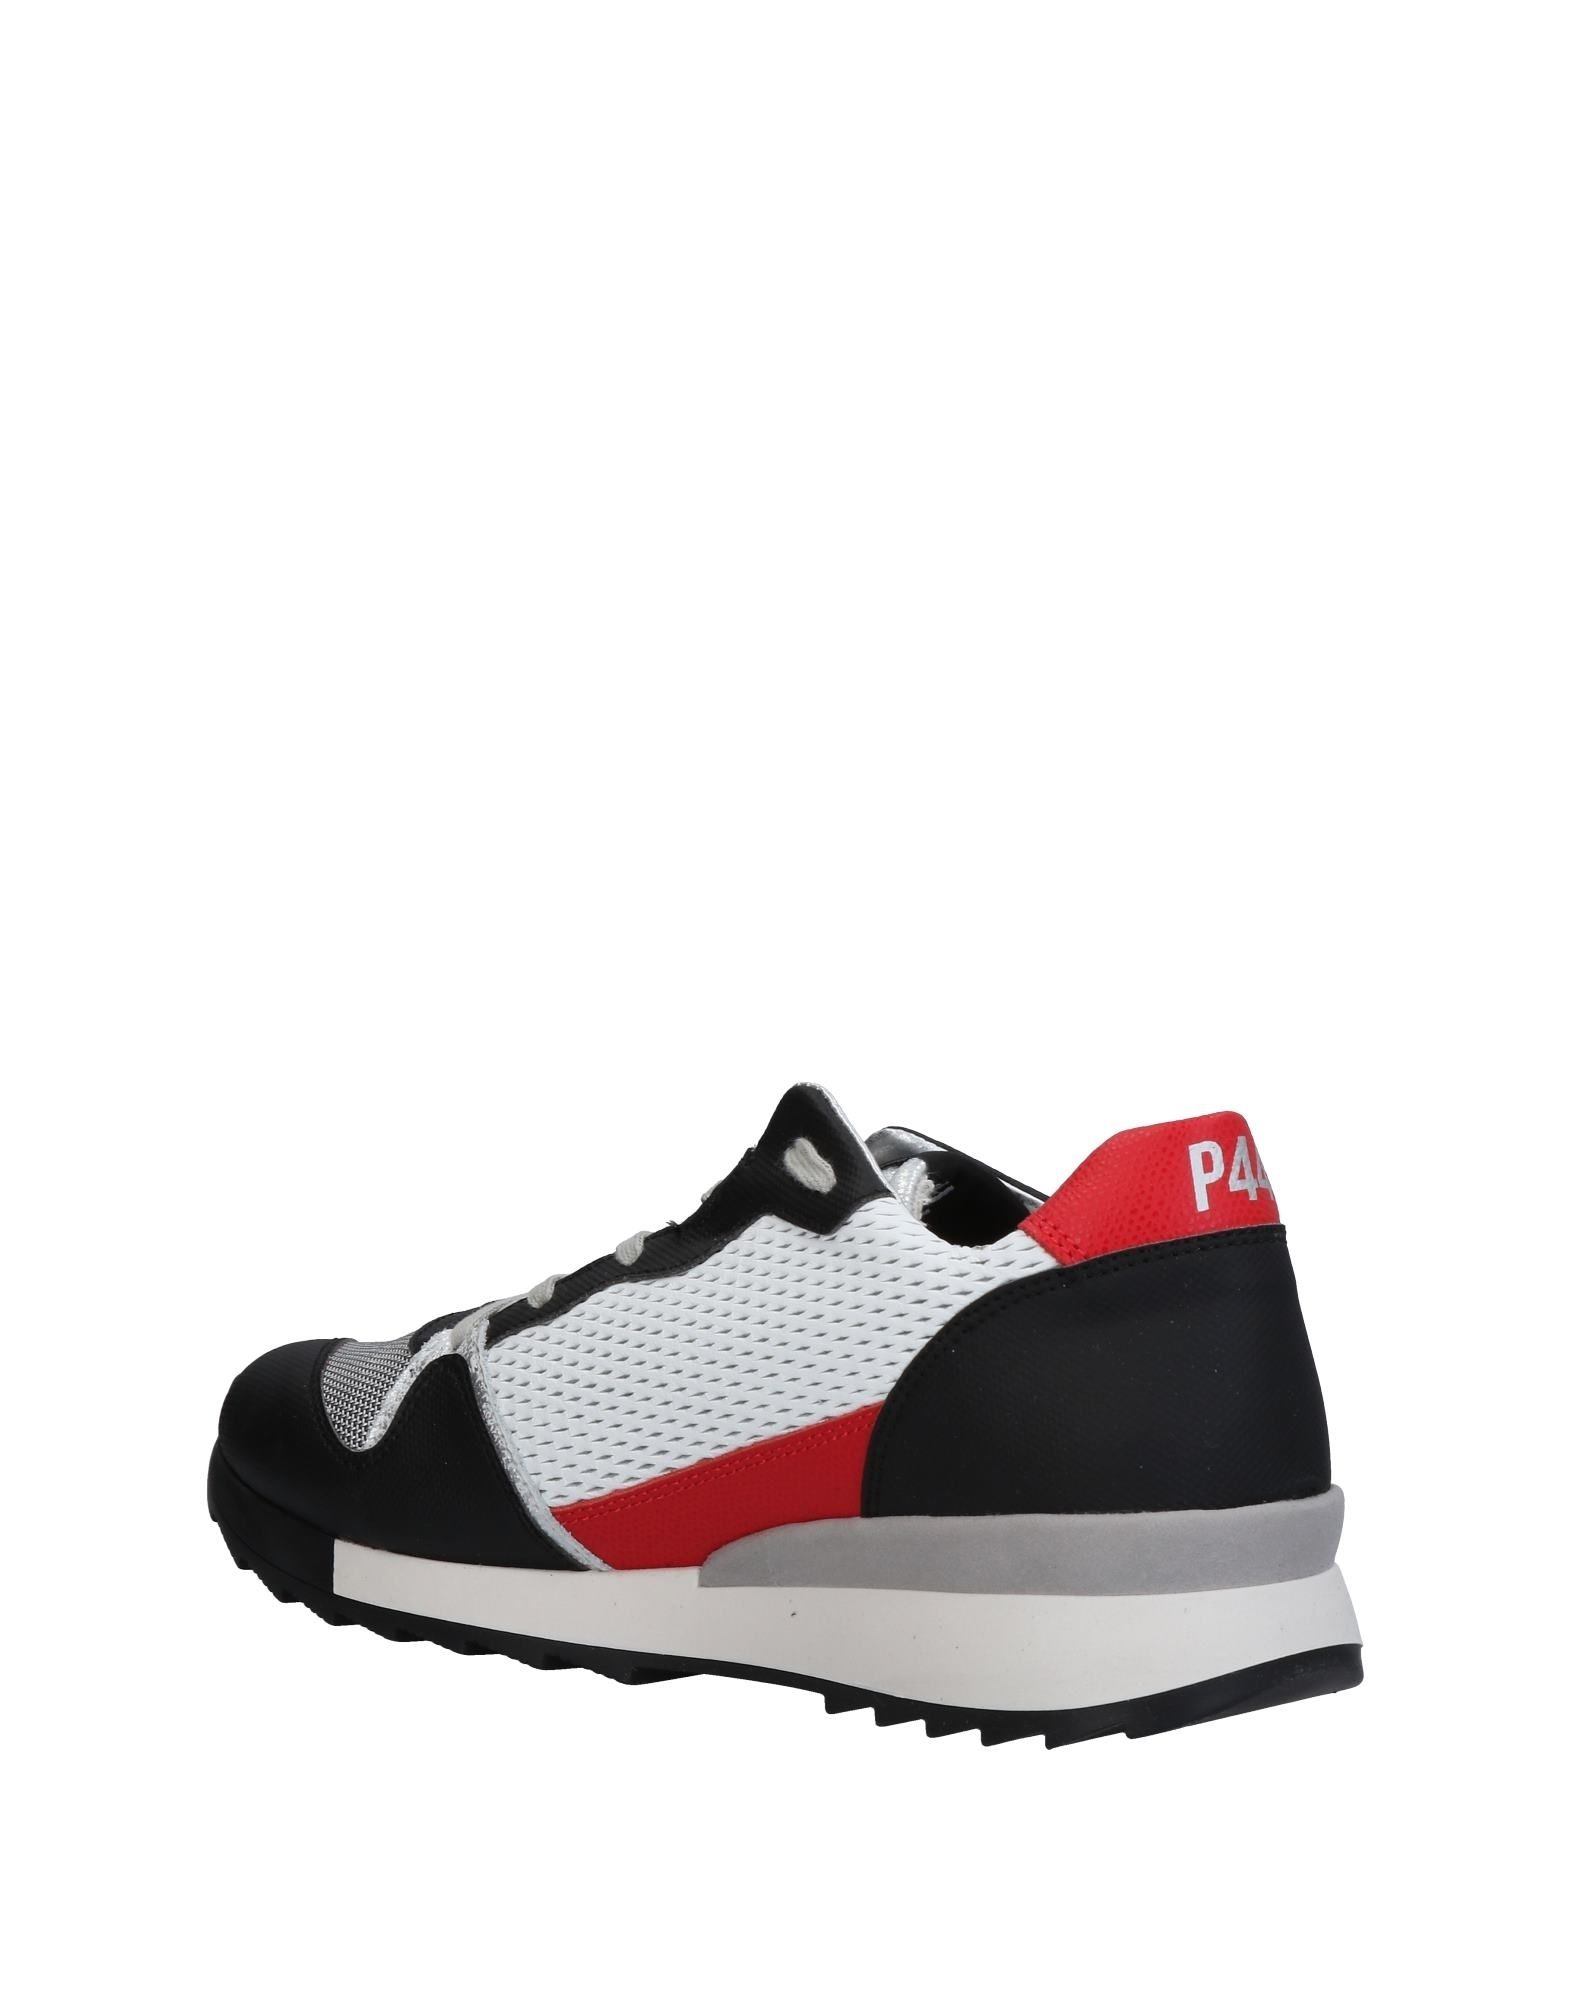 11457185DV P448 Sneakers Herren  11457185DV  5fe809